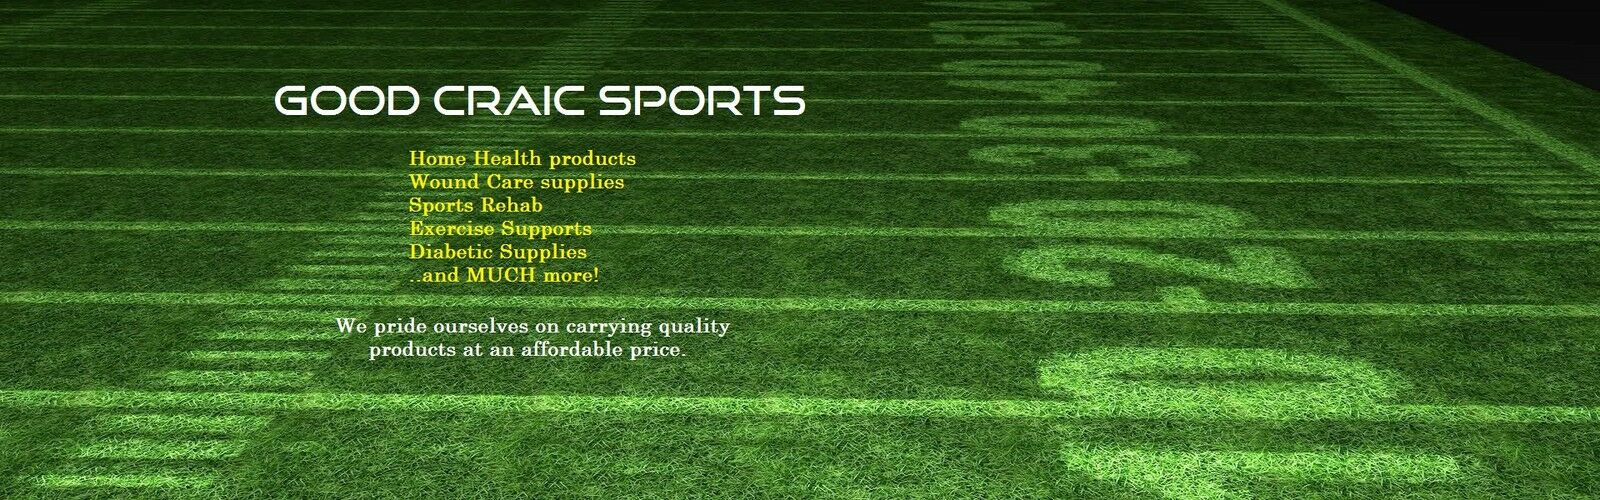 Good Craic Sports